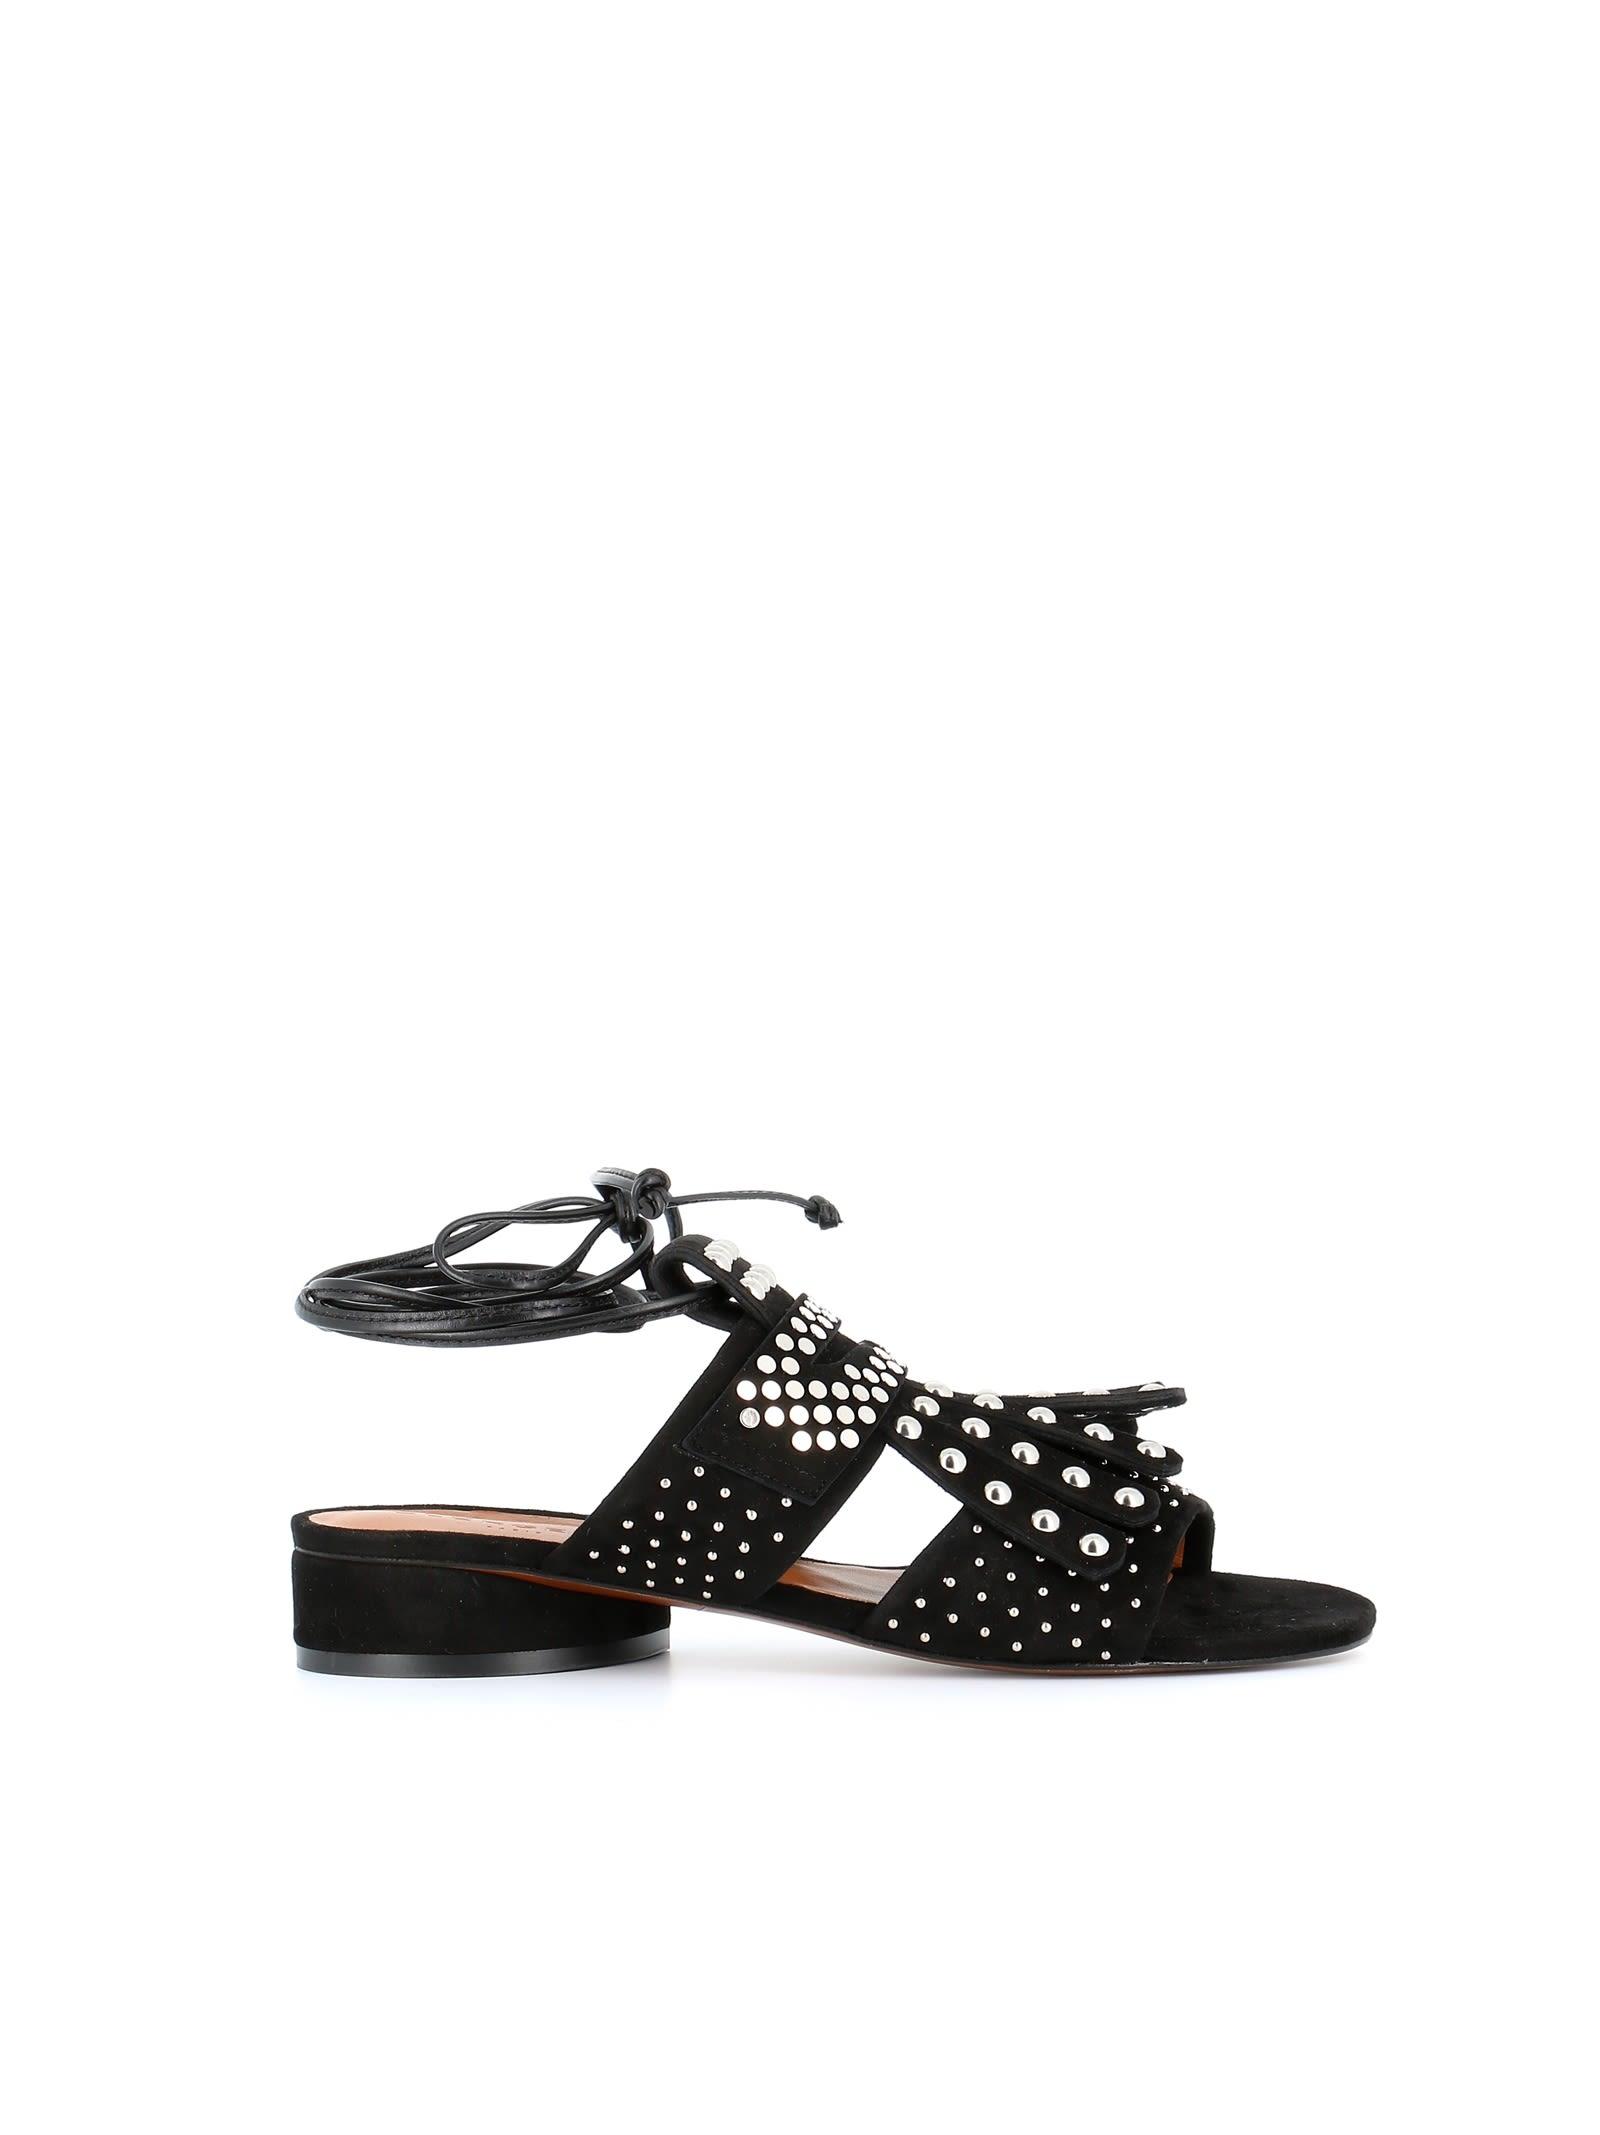 Robert Clergerie Figlouc sandals 6usVpLO